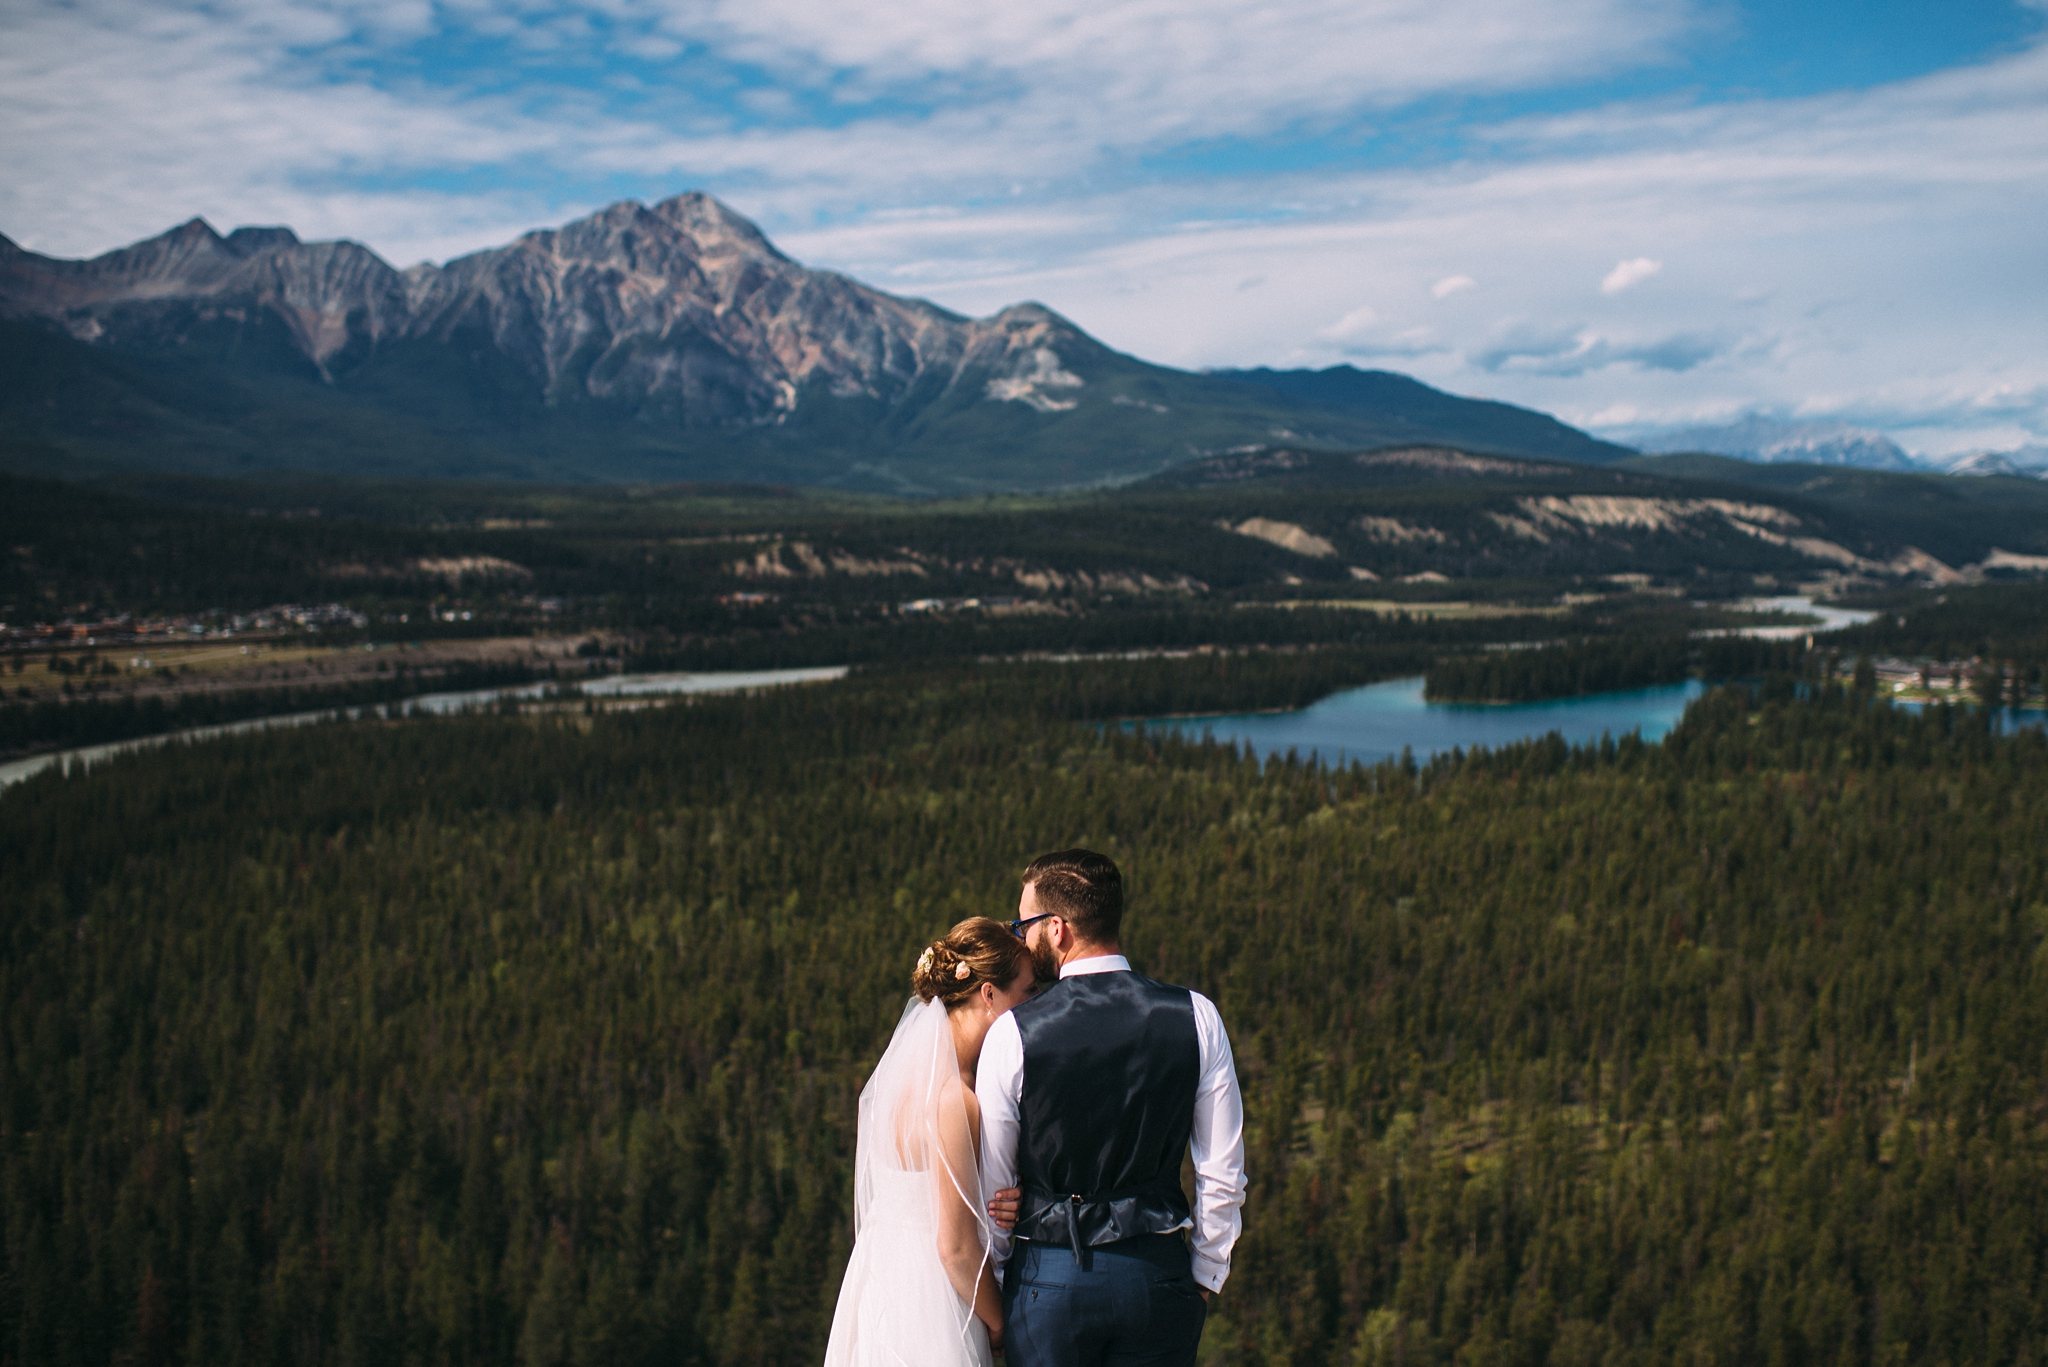 kaihla_tonai_intimate_wedding_elopement_photographer_2485